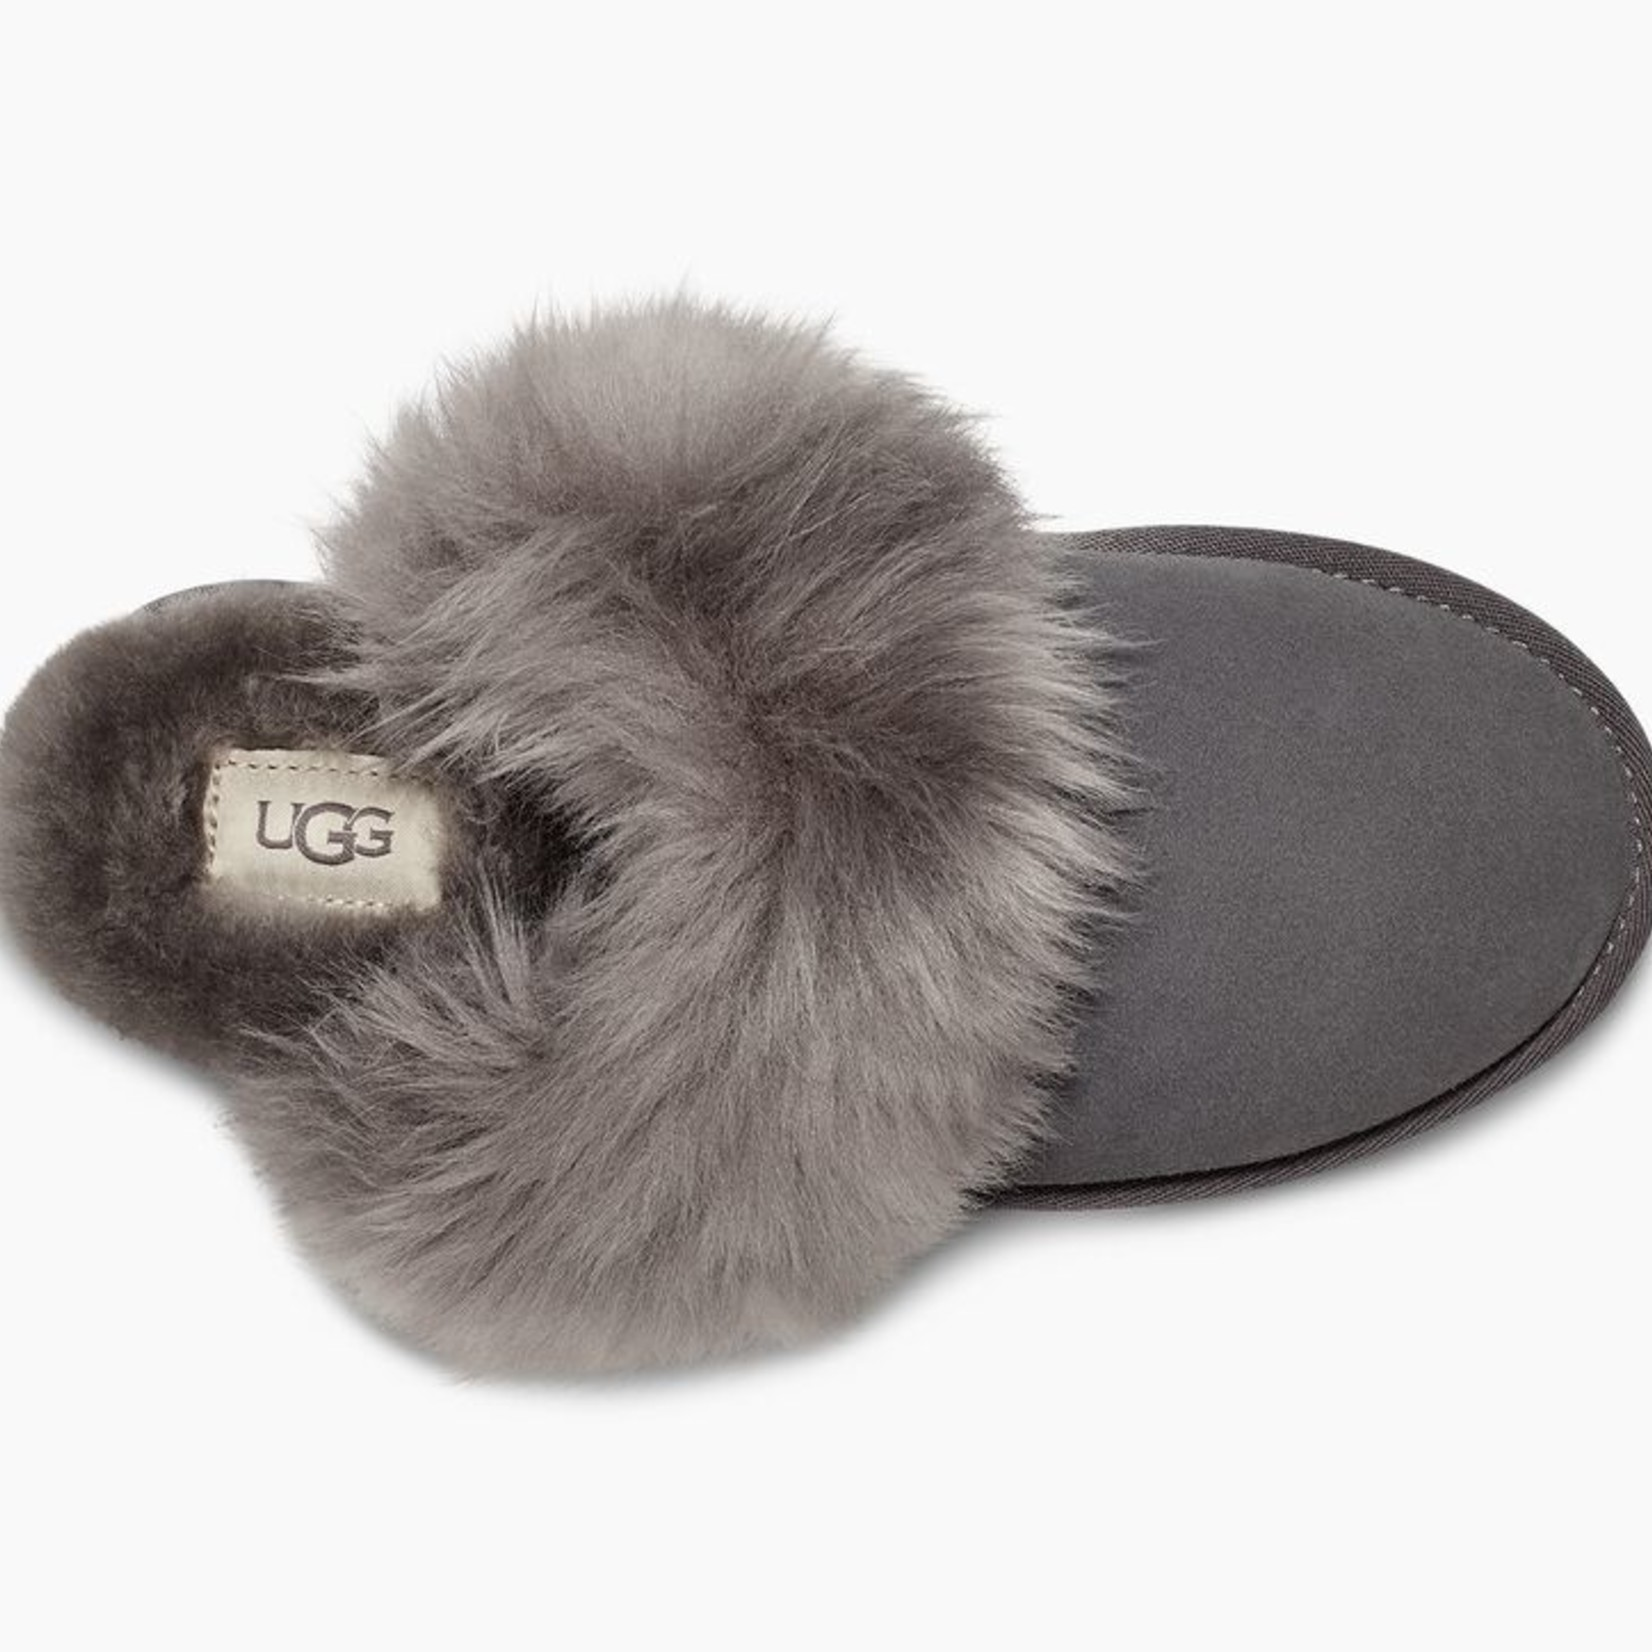 Ugg Ugg Women's Scuff Sis Sheepskin Slippers